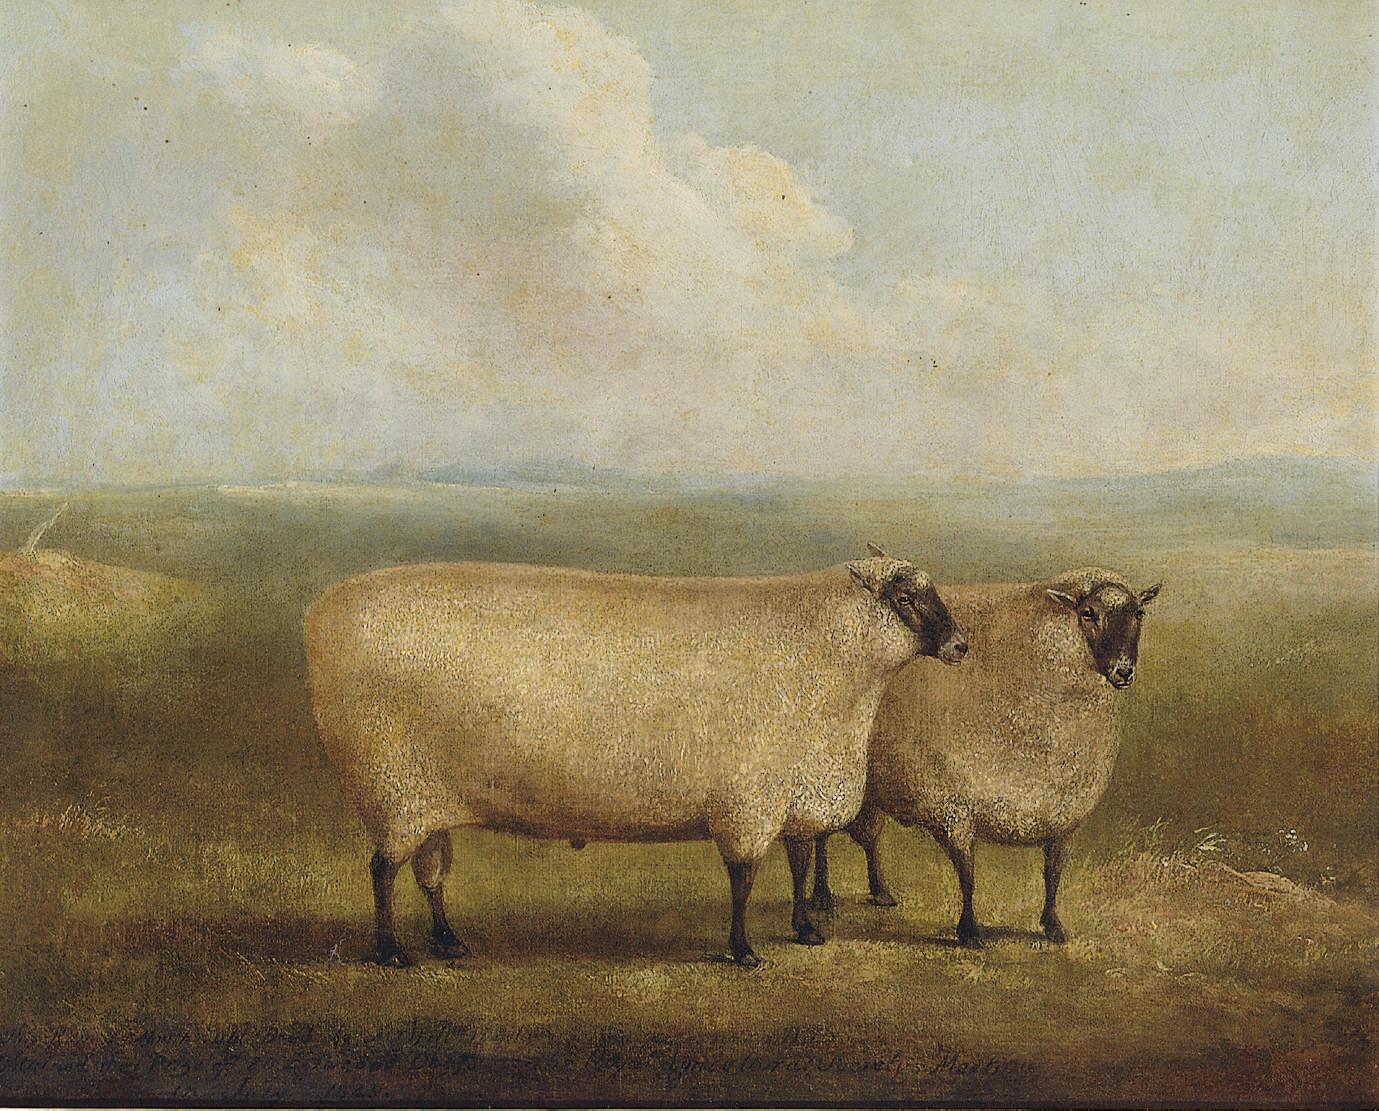 James Loder of Bath (Bath 1784